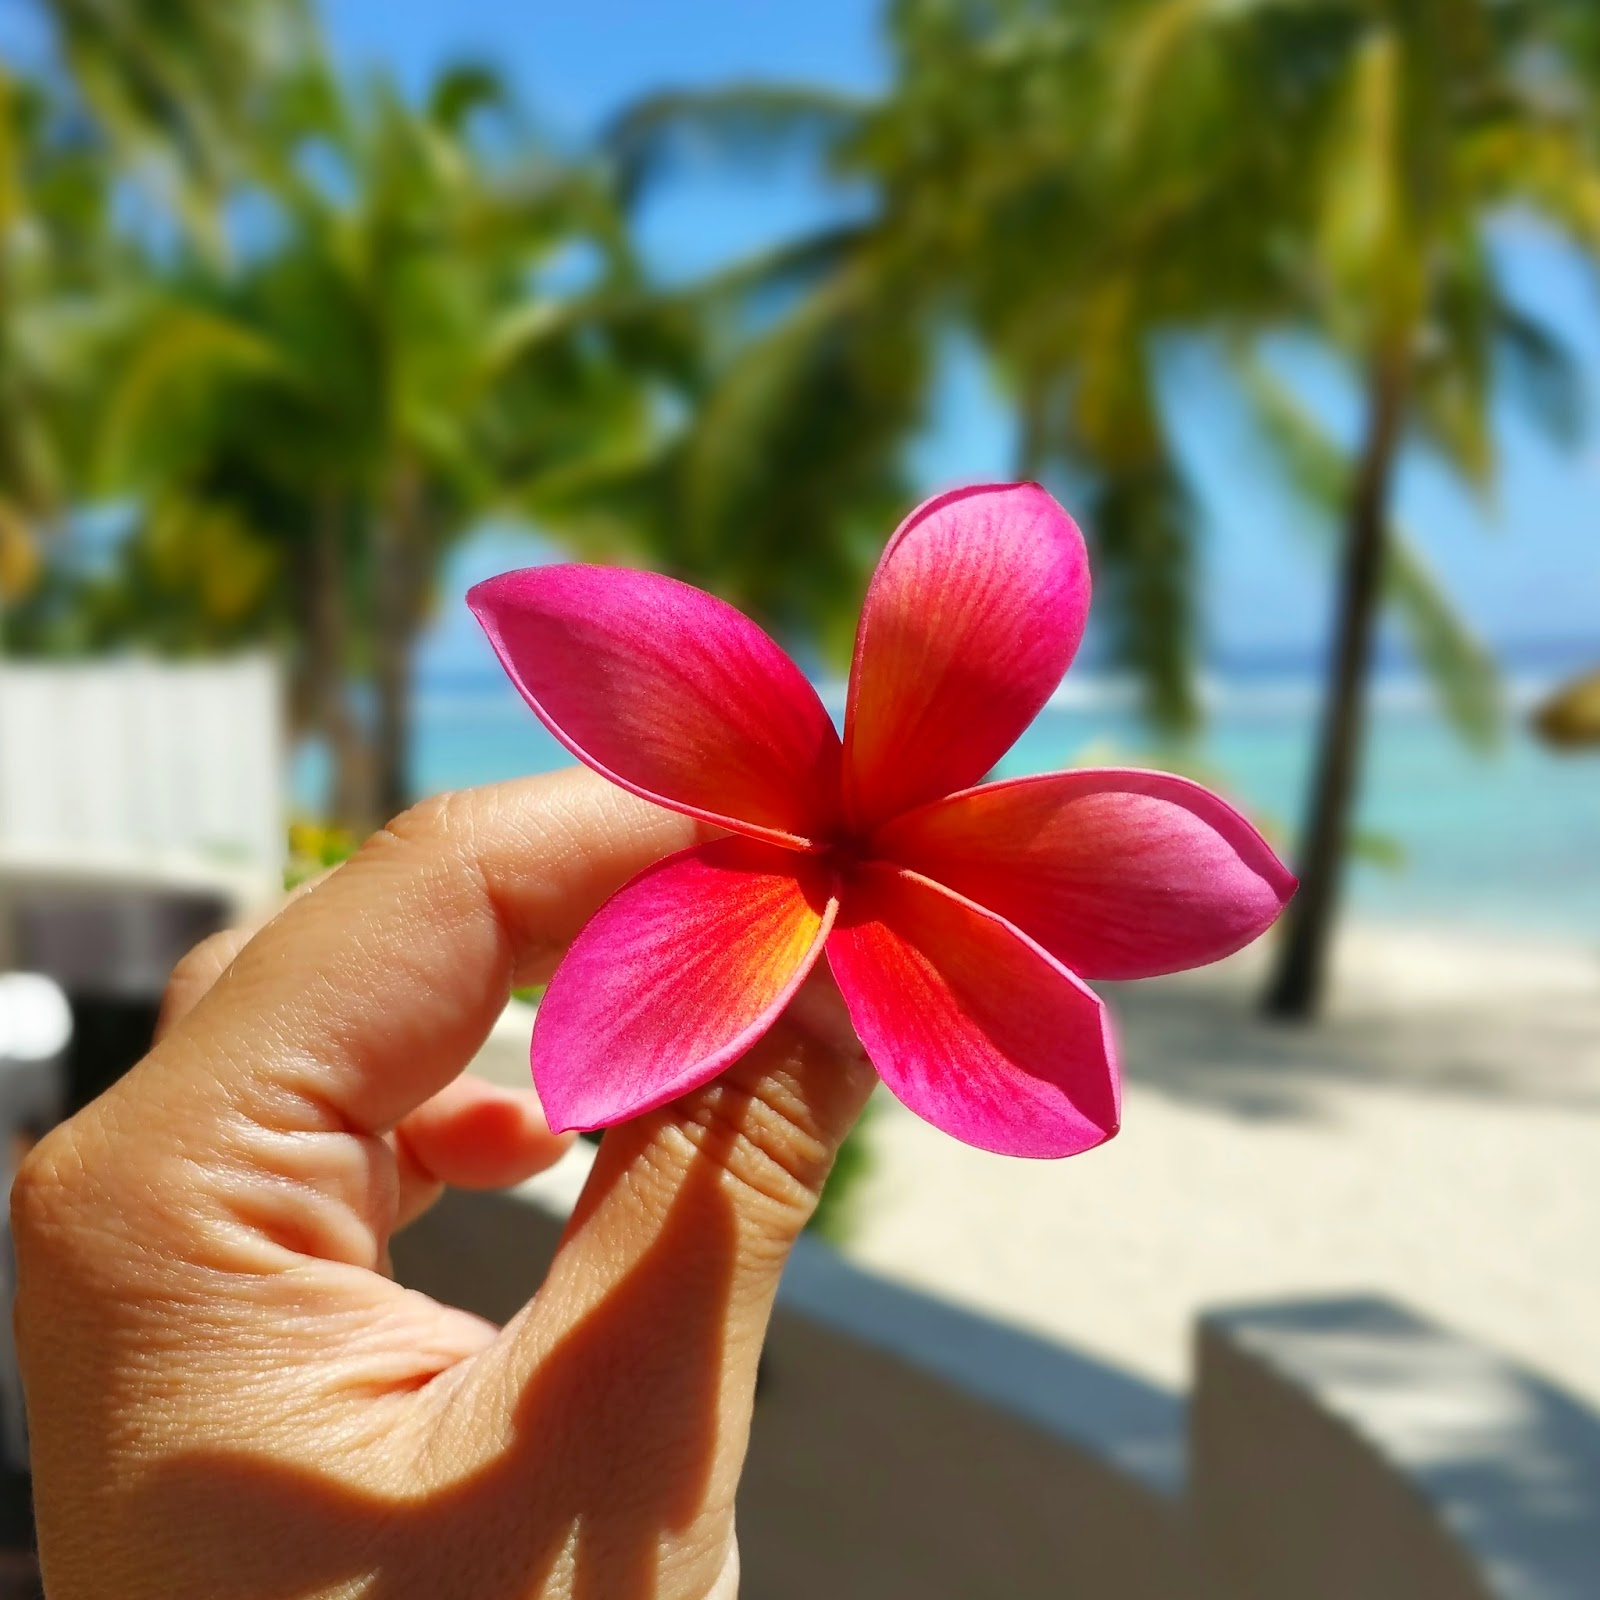 Fior di frangipani carminio - foto di Elisa Chisana Hoshi